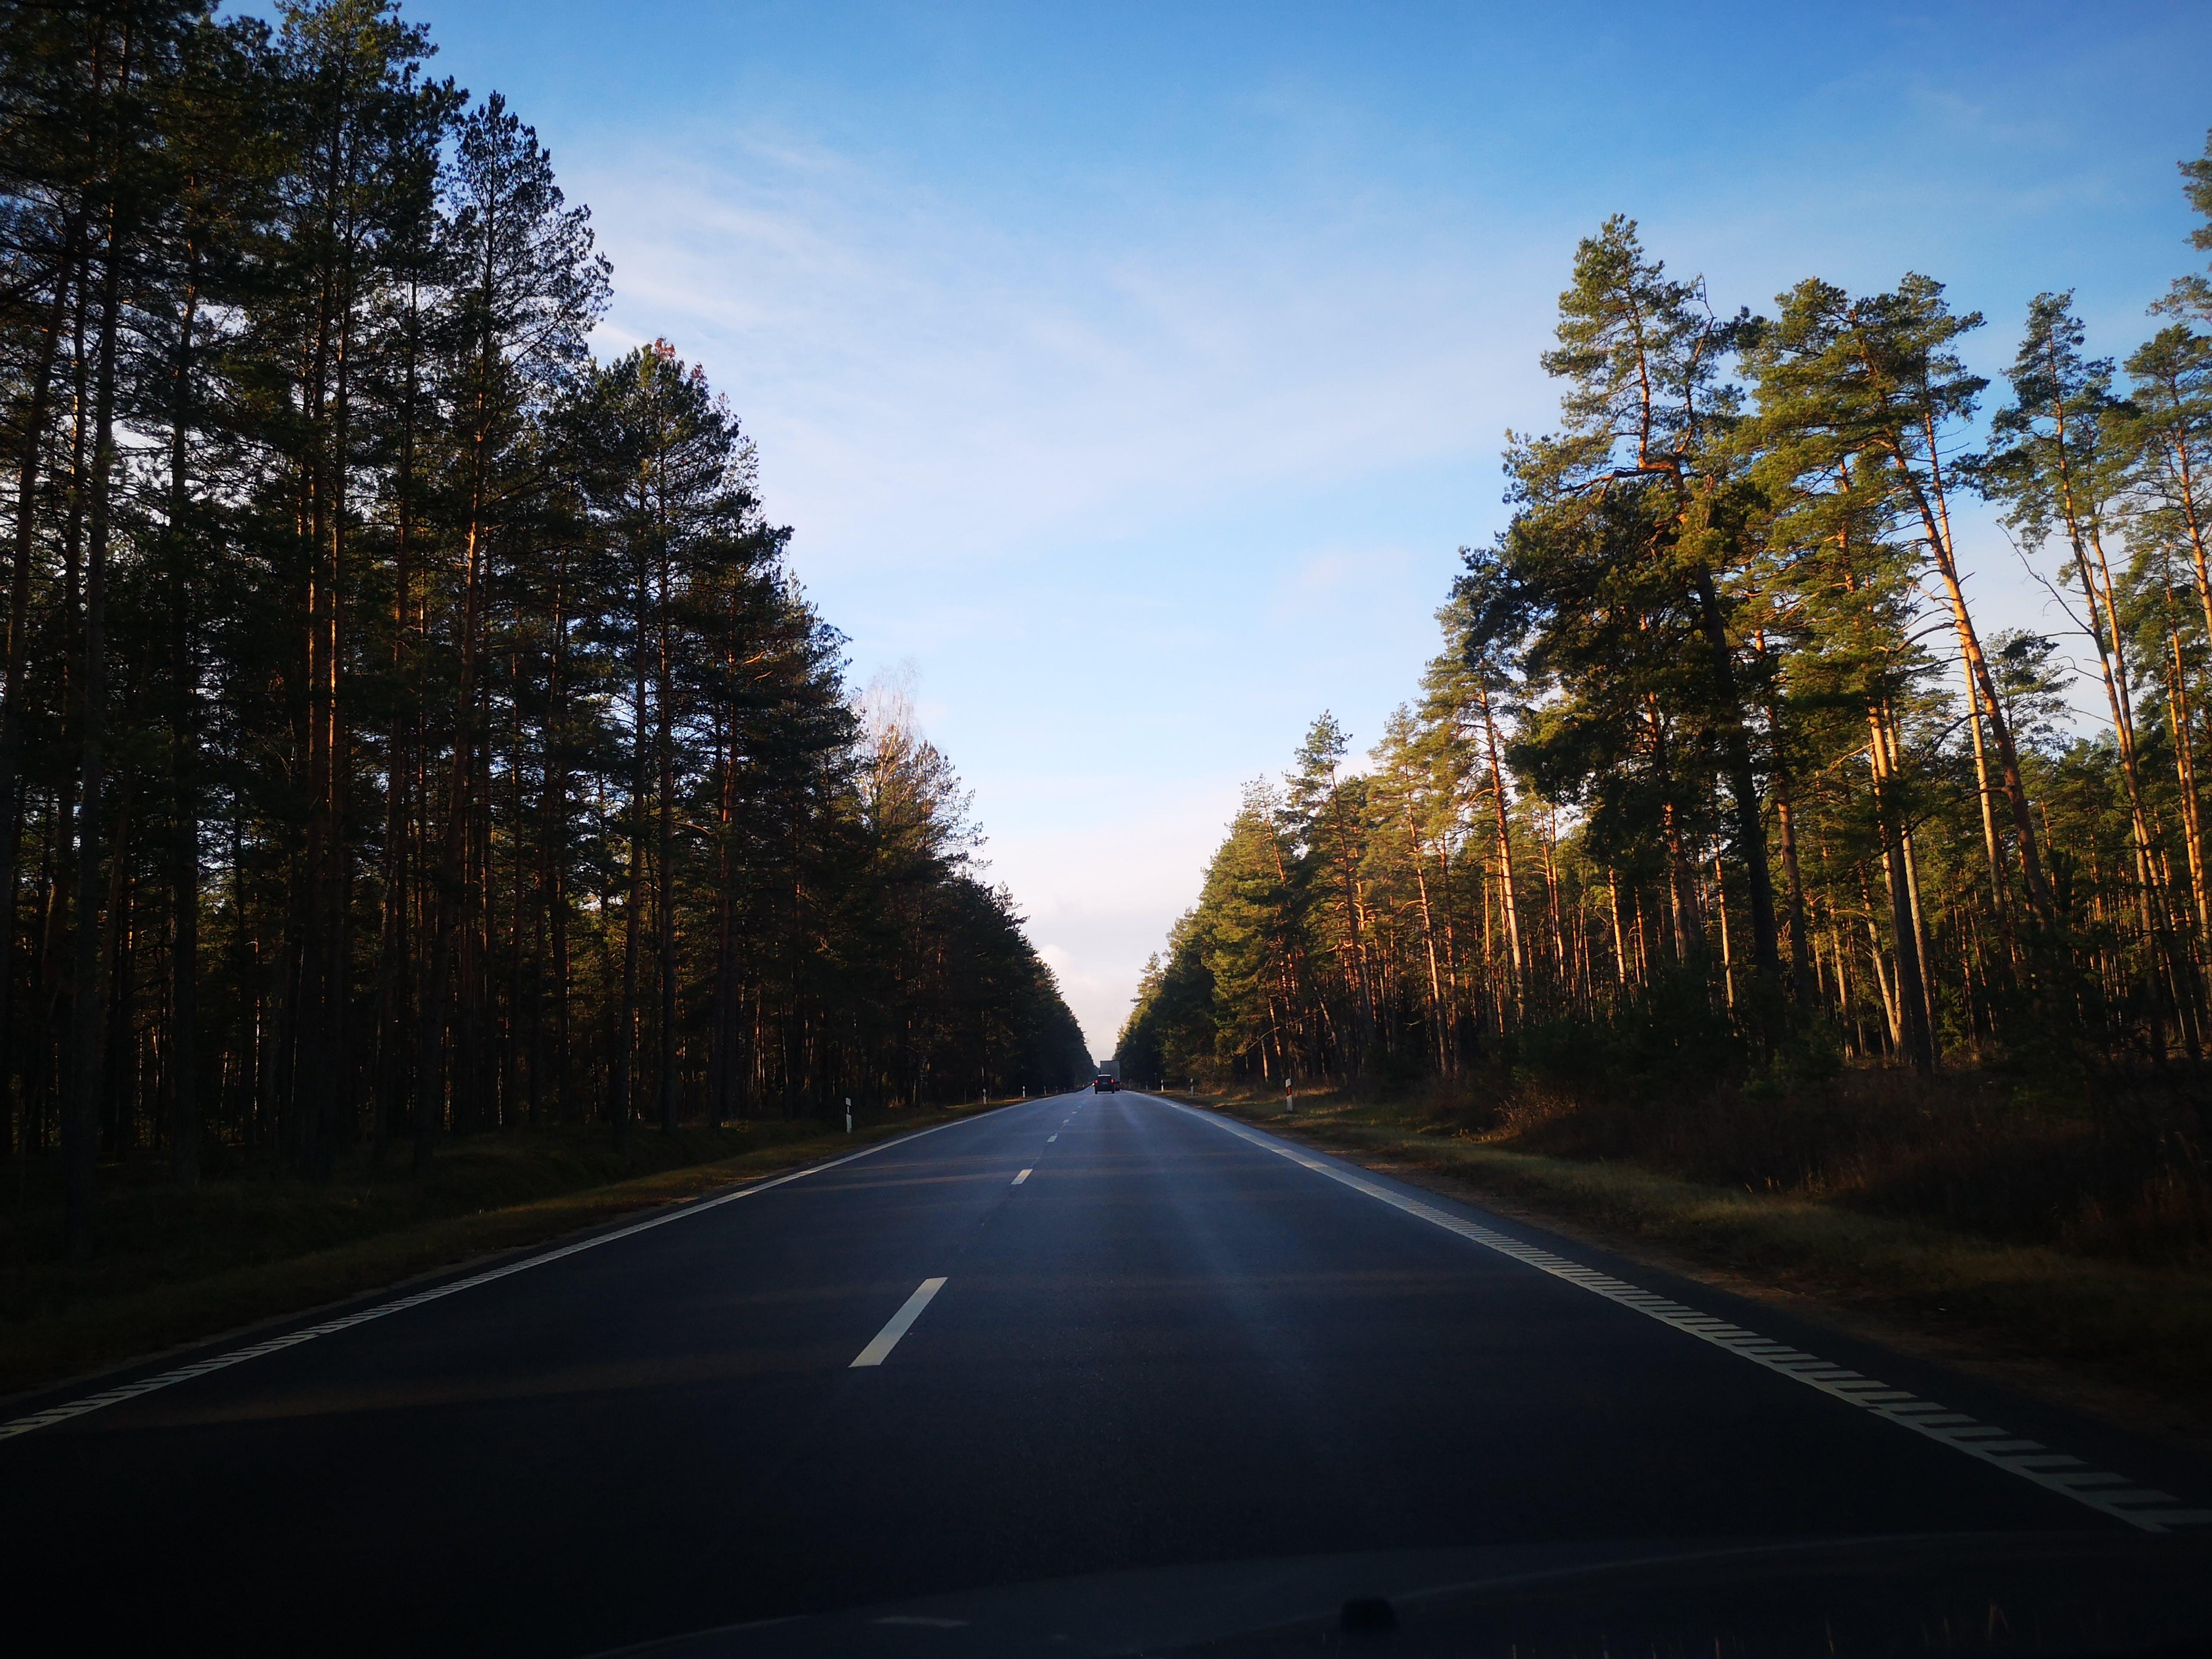 zu asphalt, autobahn, bäume, fahrt